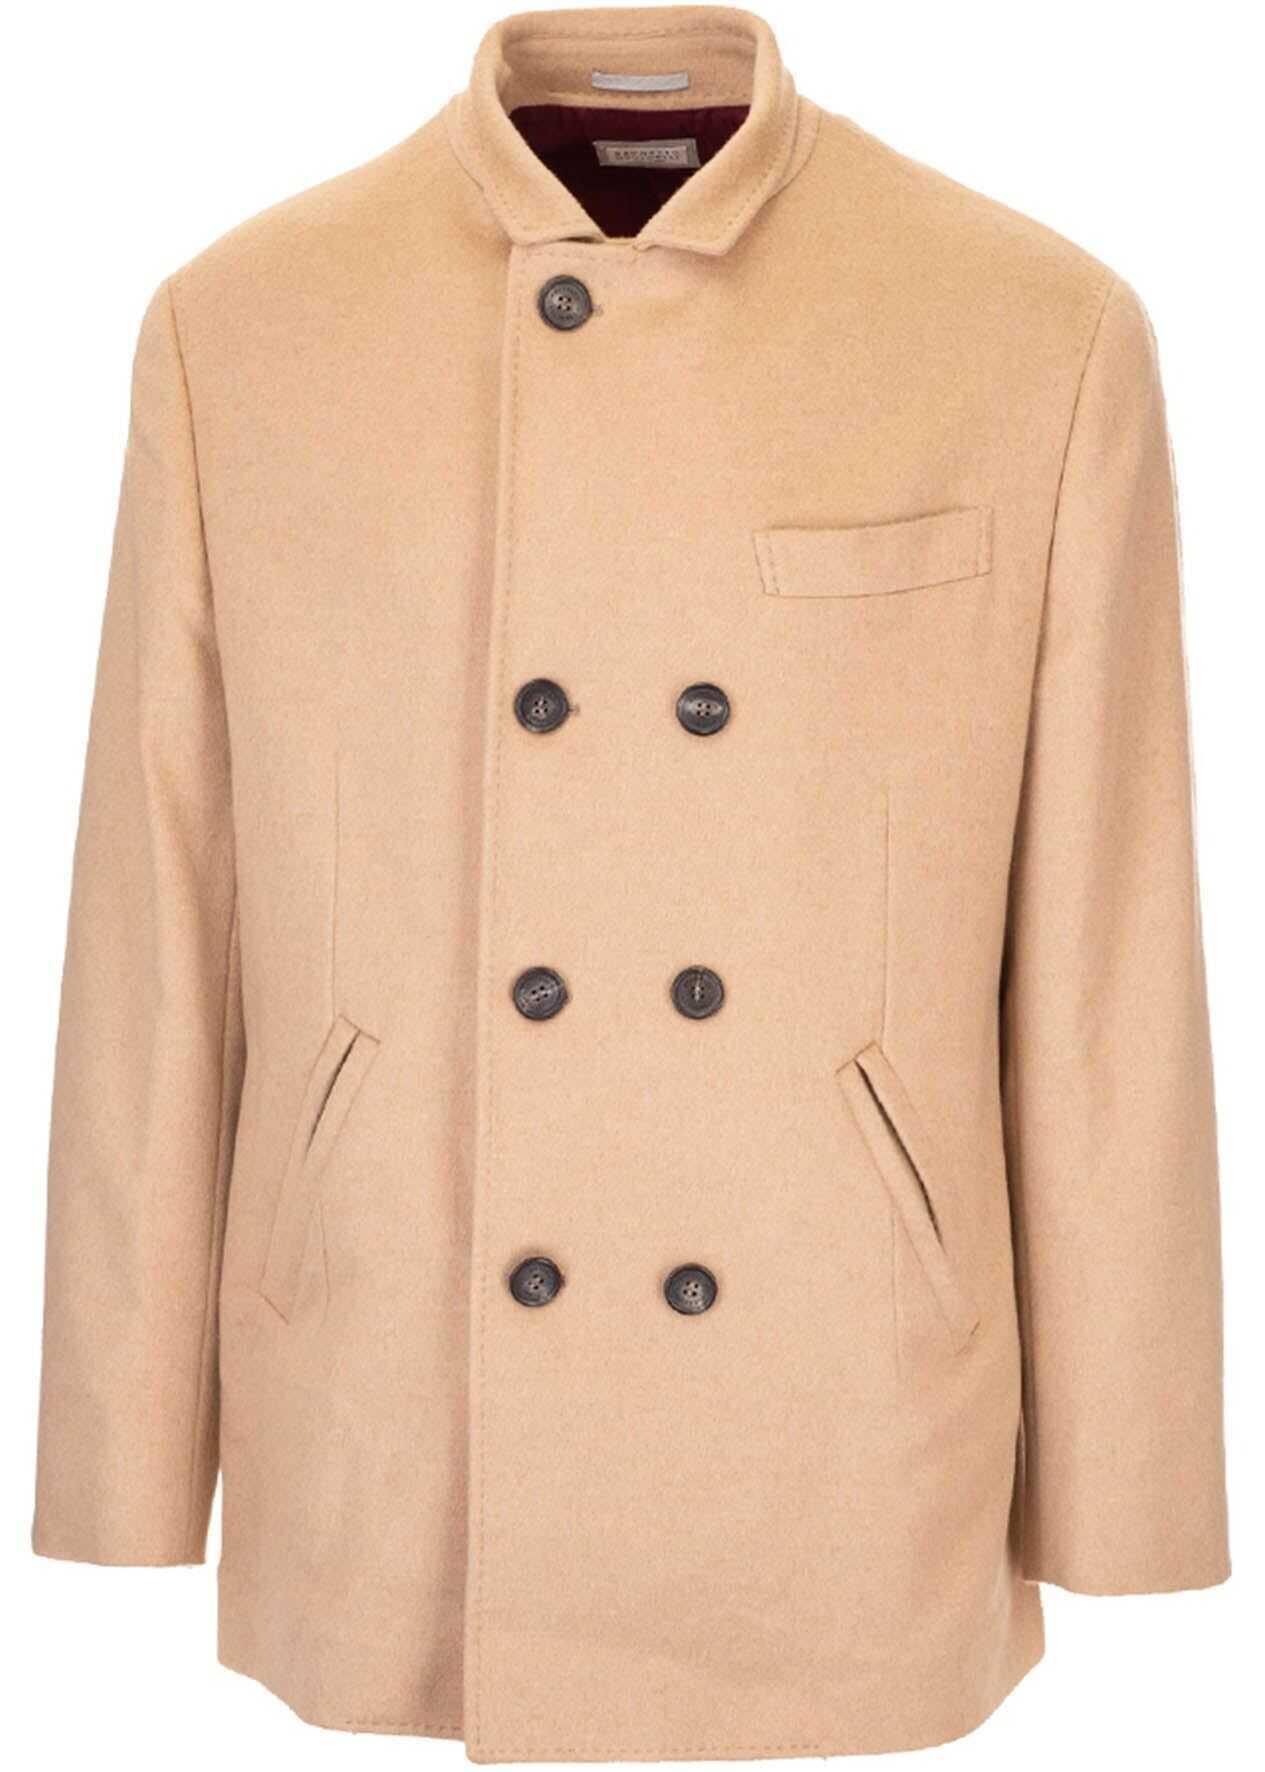 Brunello Cucinelli Double-Breasted Coat In Beige Beige imagine